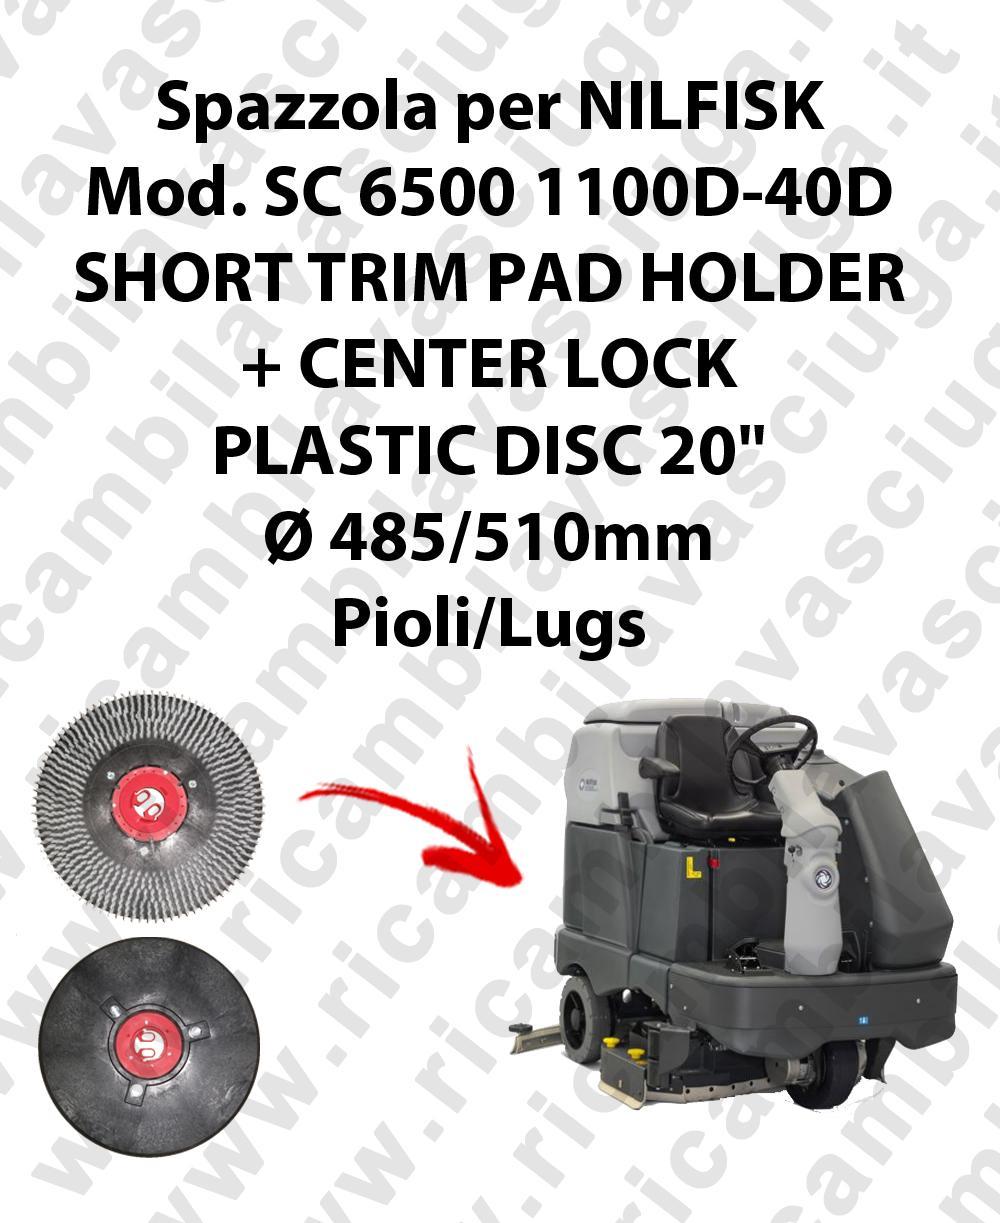 SHORT TRIM PAD HOLDER + CENTERLOCK per lavapavimenti NILFISK mod. SC 6500-40D